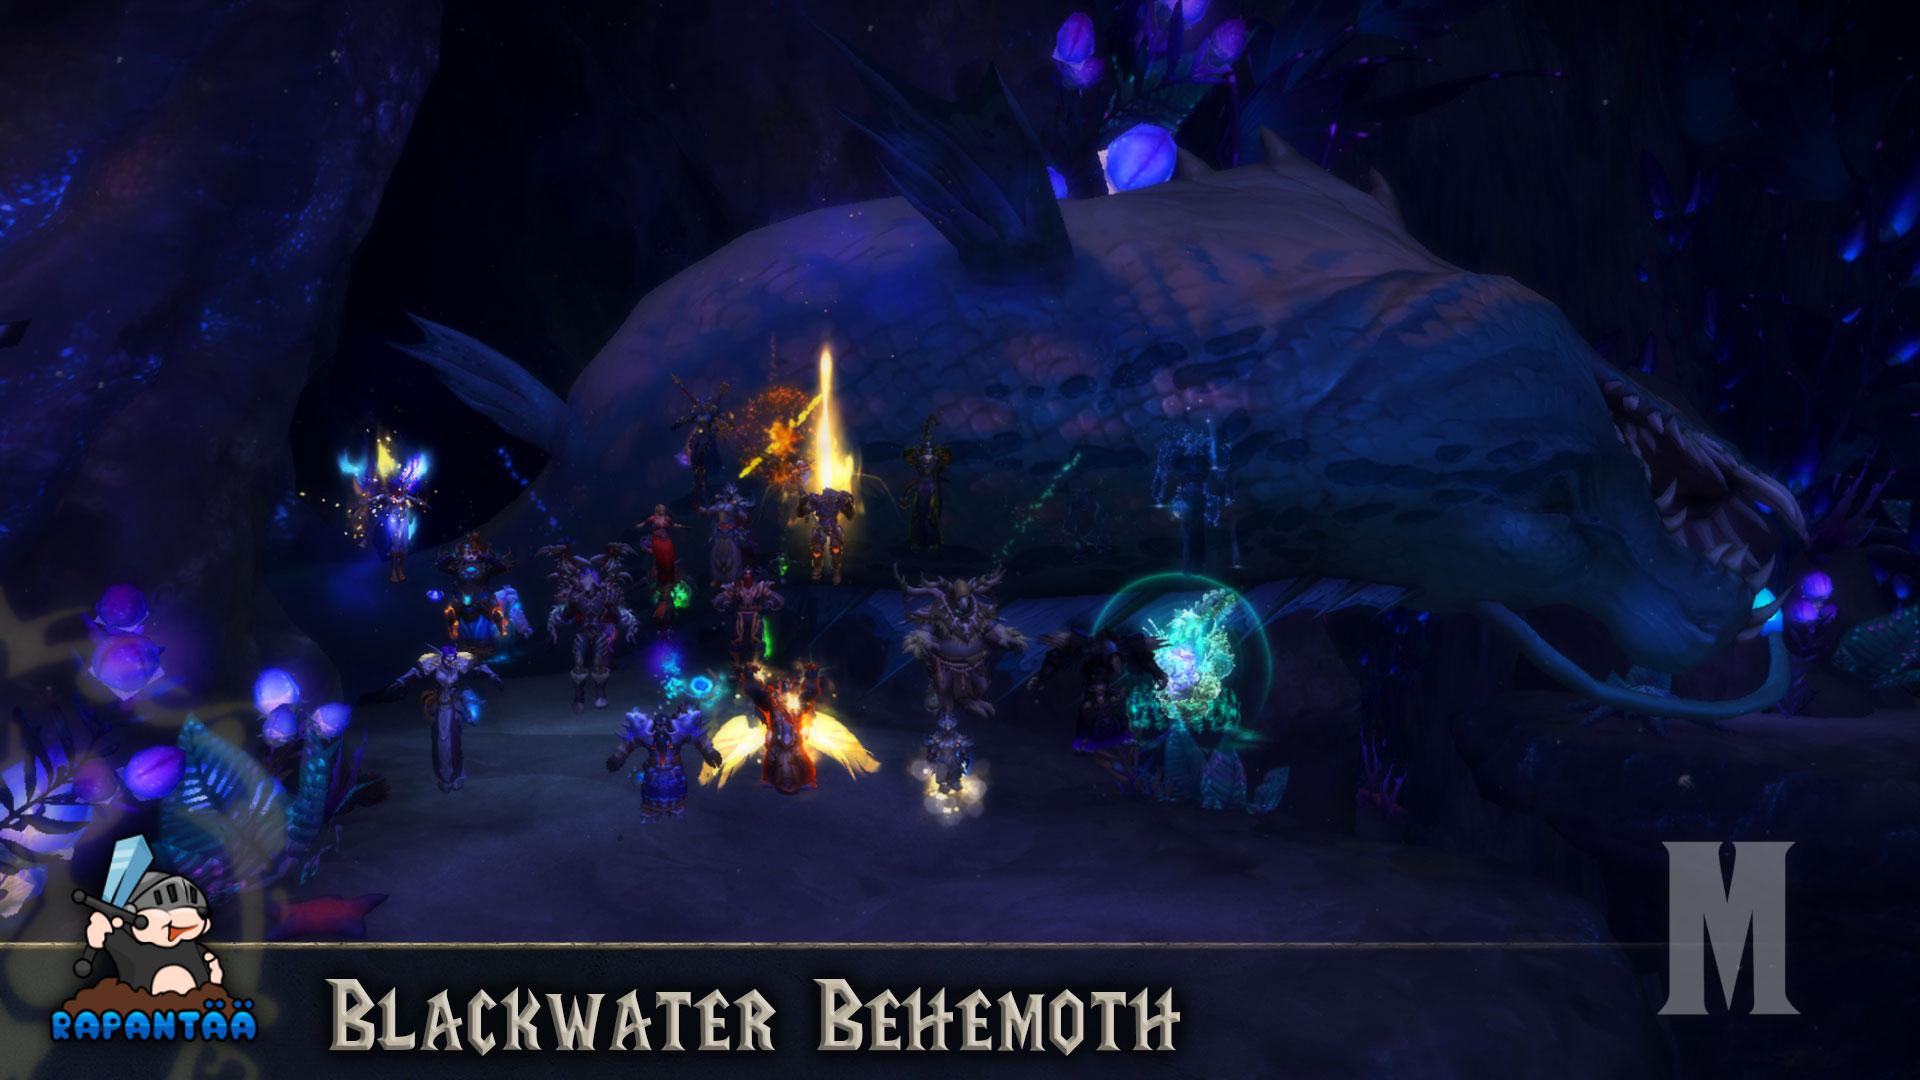 blackwater-behemoth-m-12.09.2019